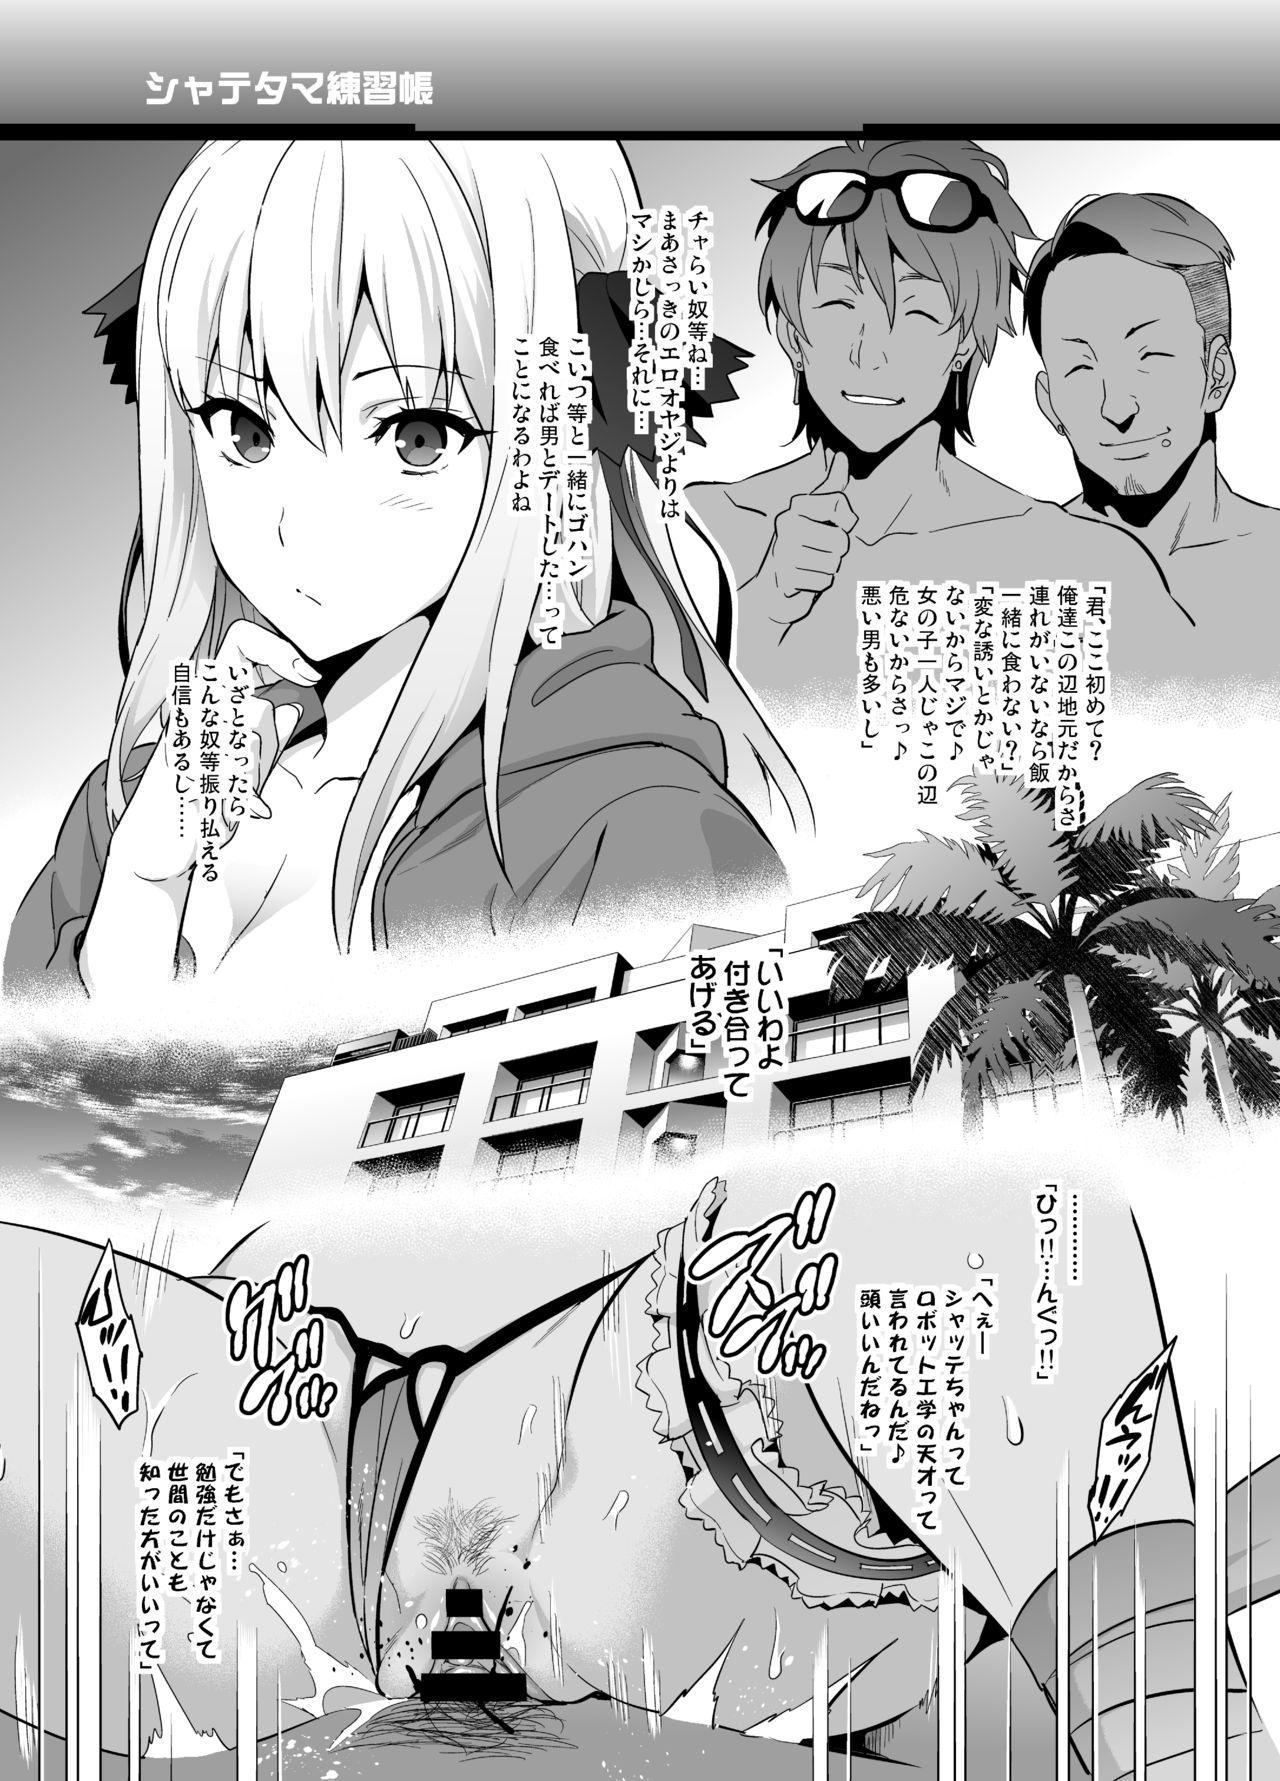 Shate-tama Renshuuchou 3